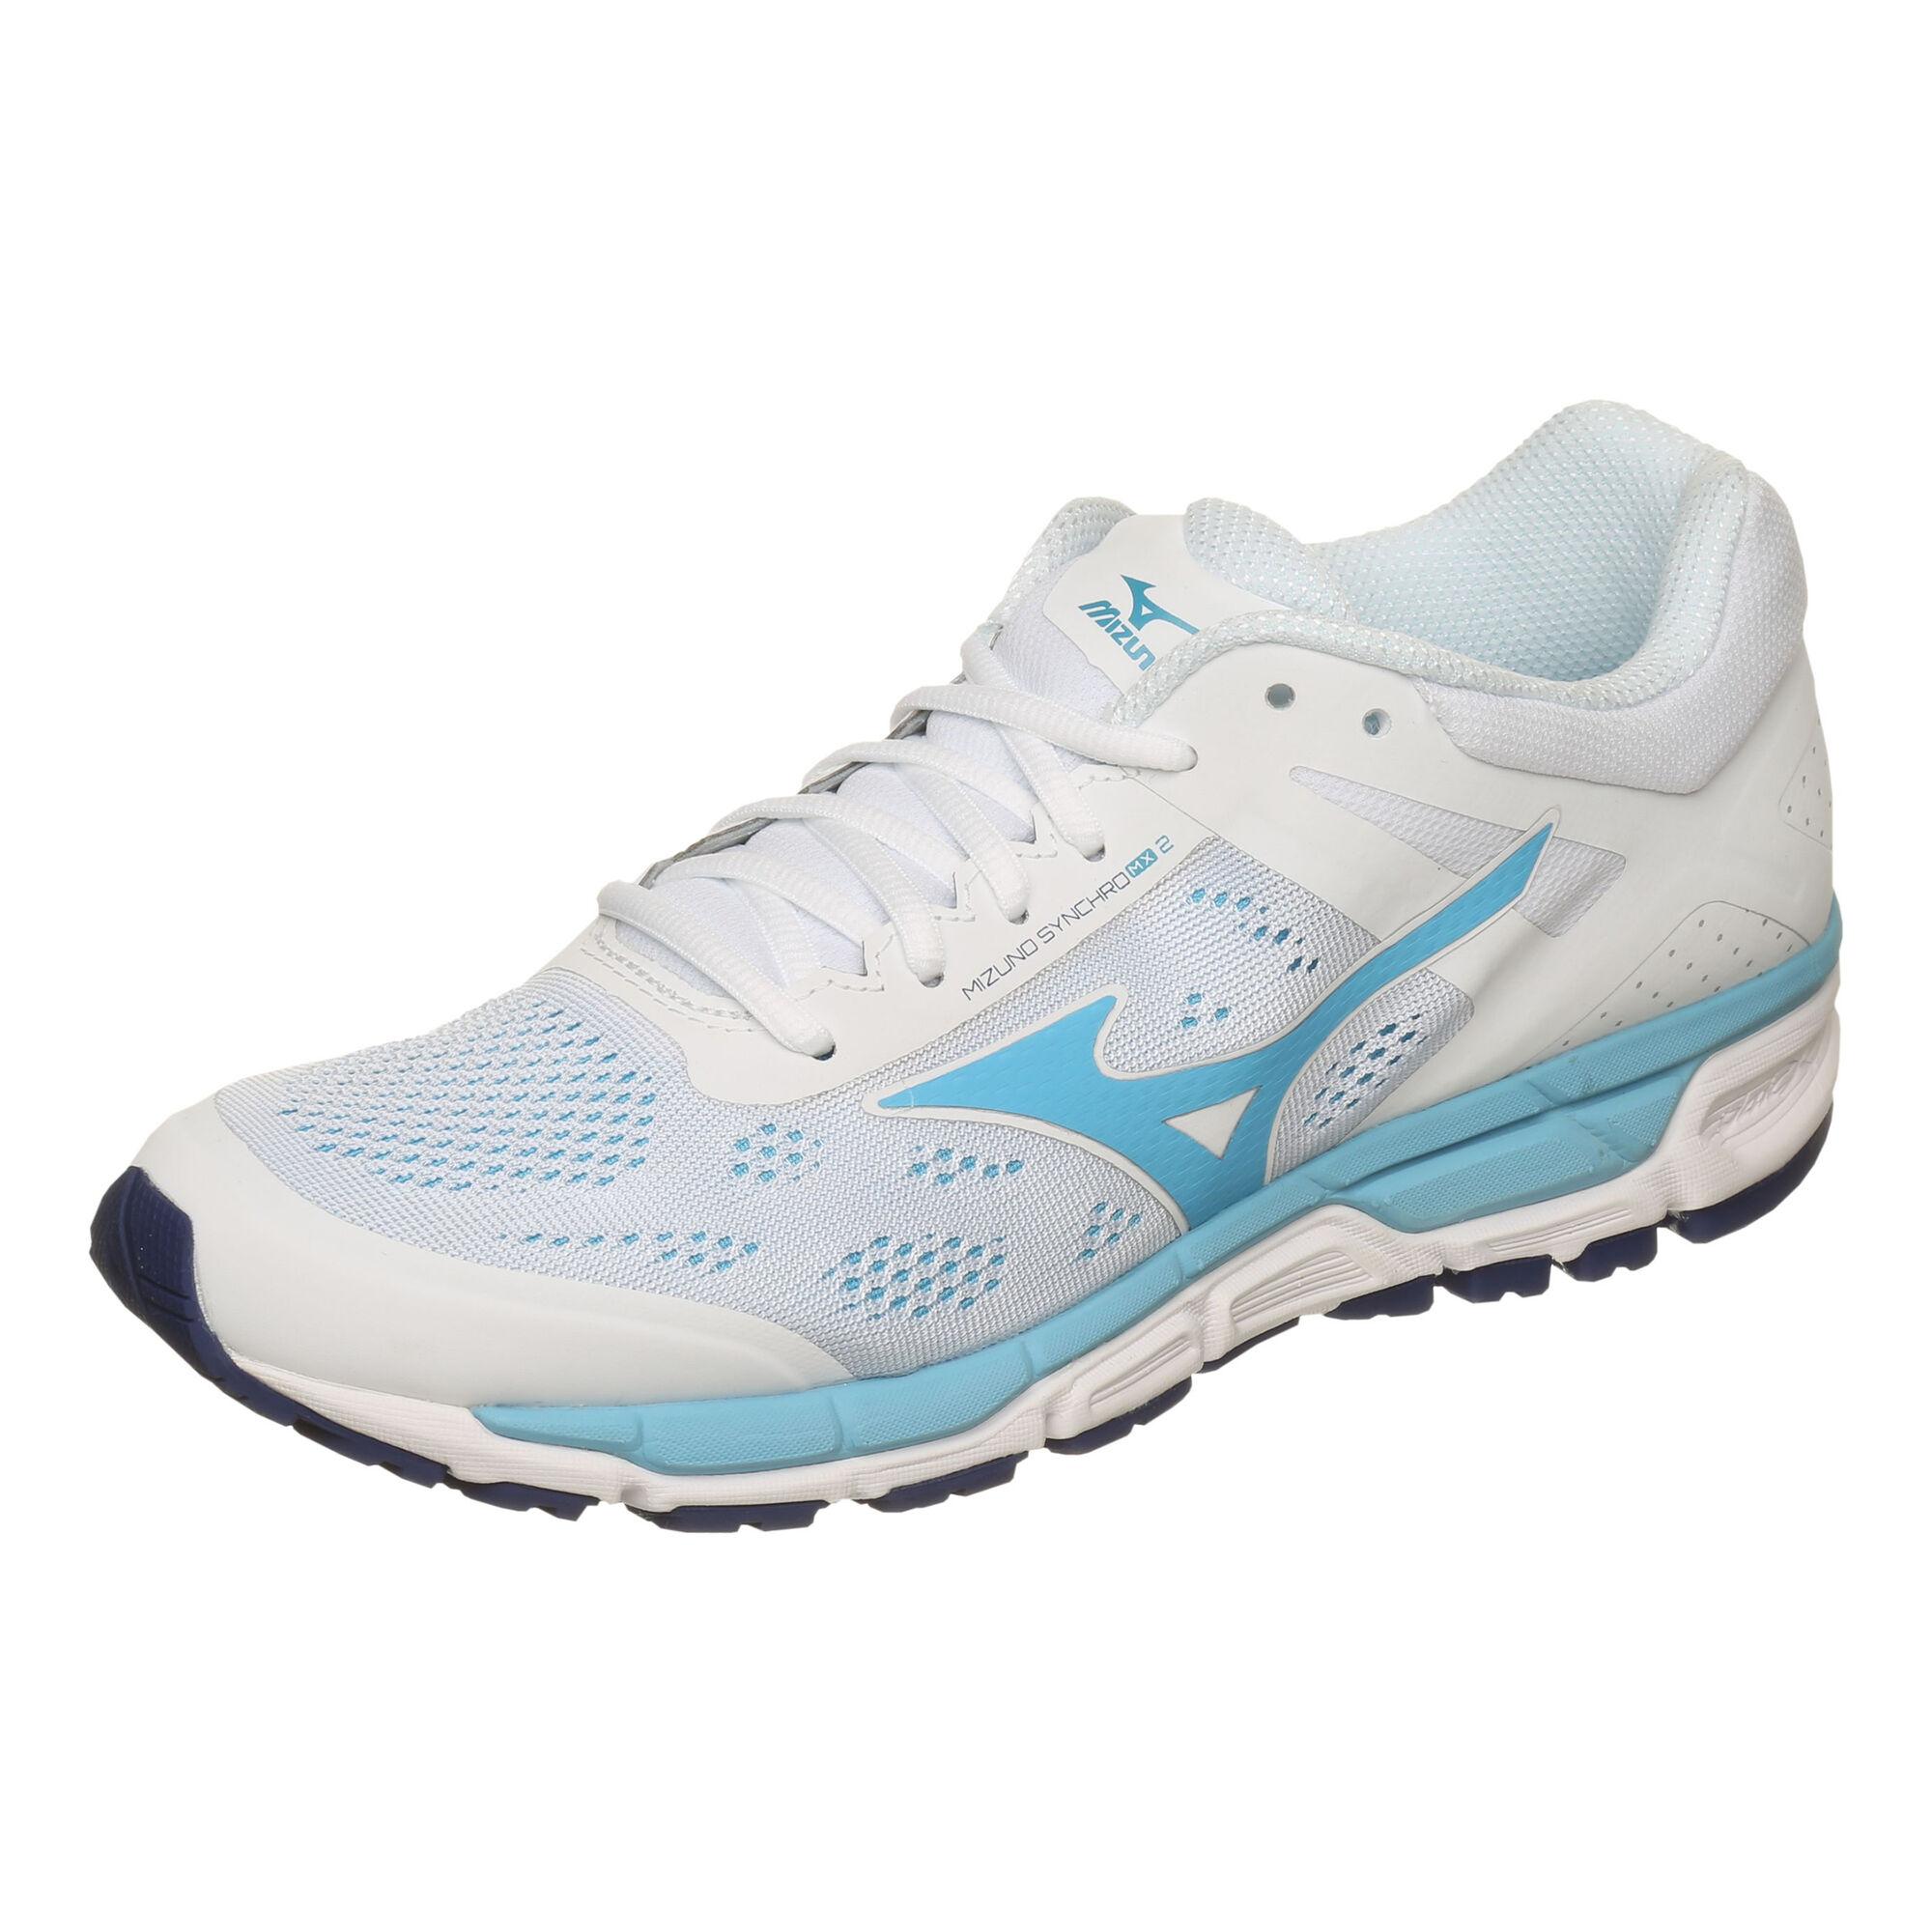 mizuno synchro mx 2 running shoes low price